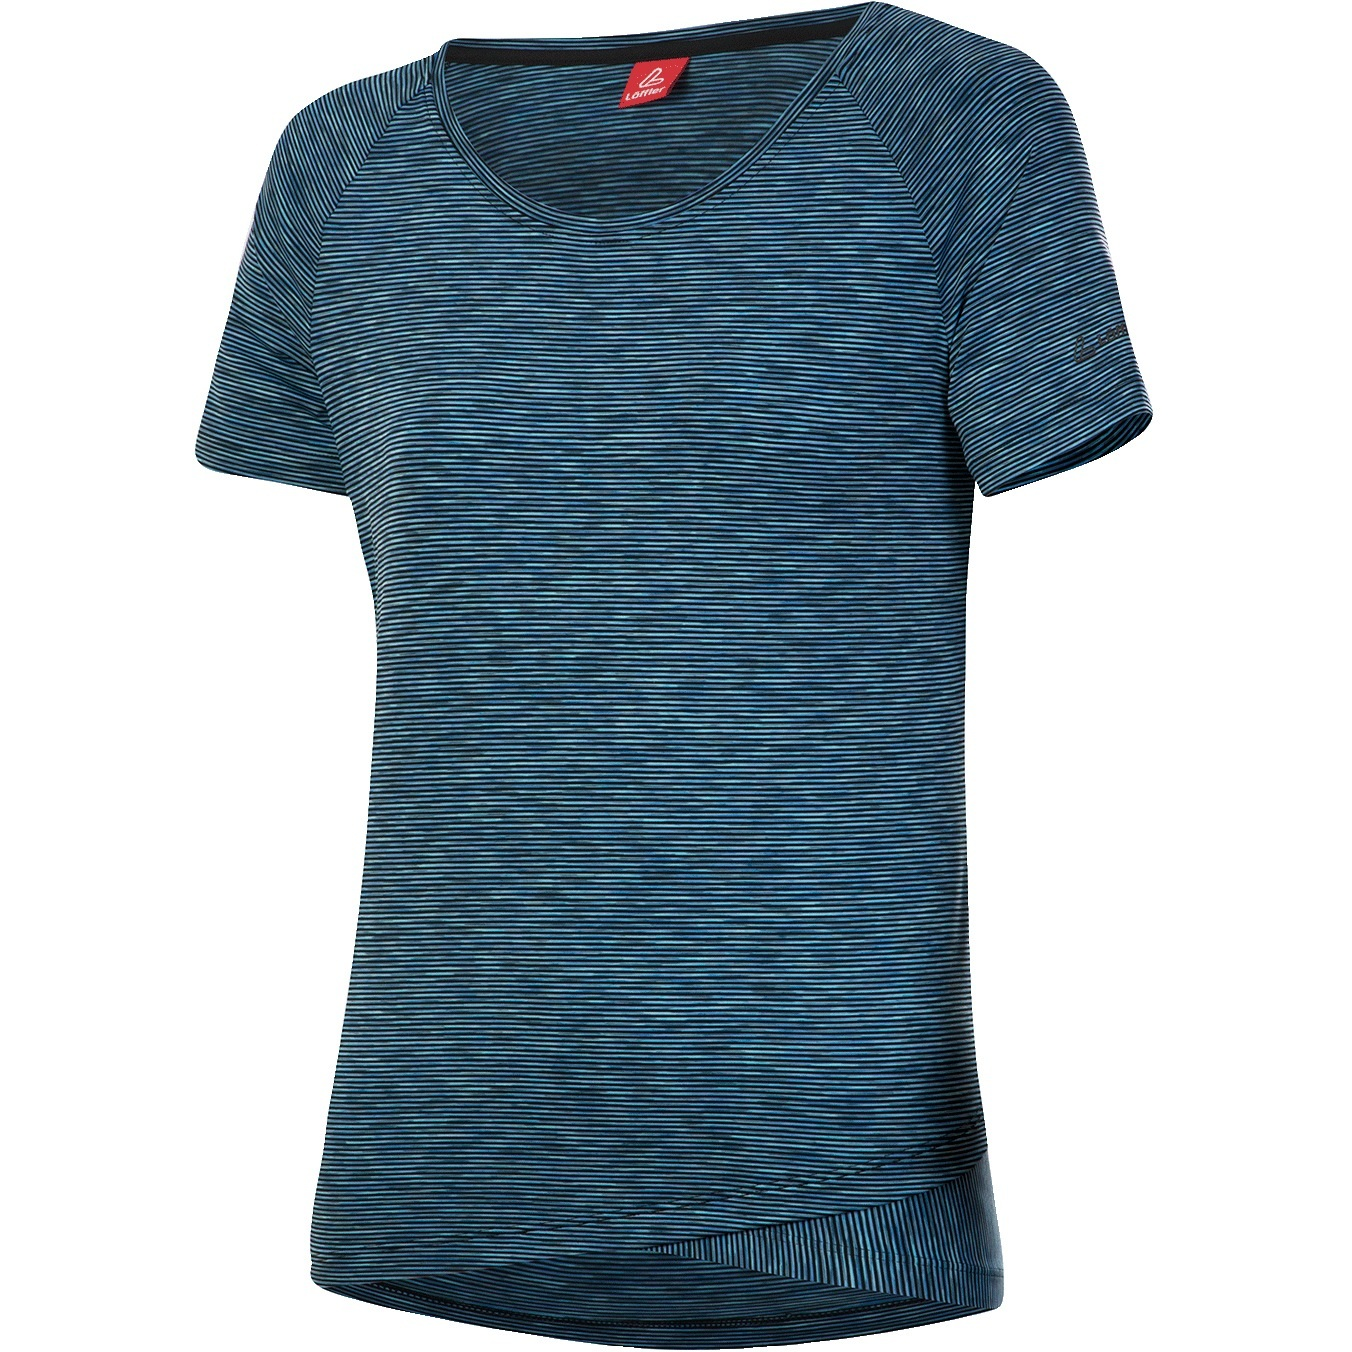 Löffler Bike T-Shirt Raingle Damen 24692 - blue lake rainbow 726